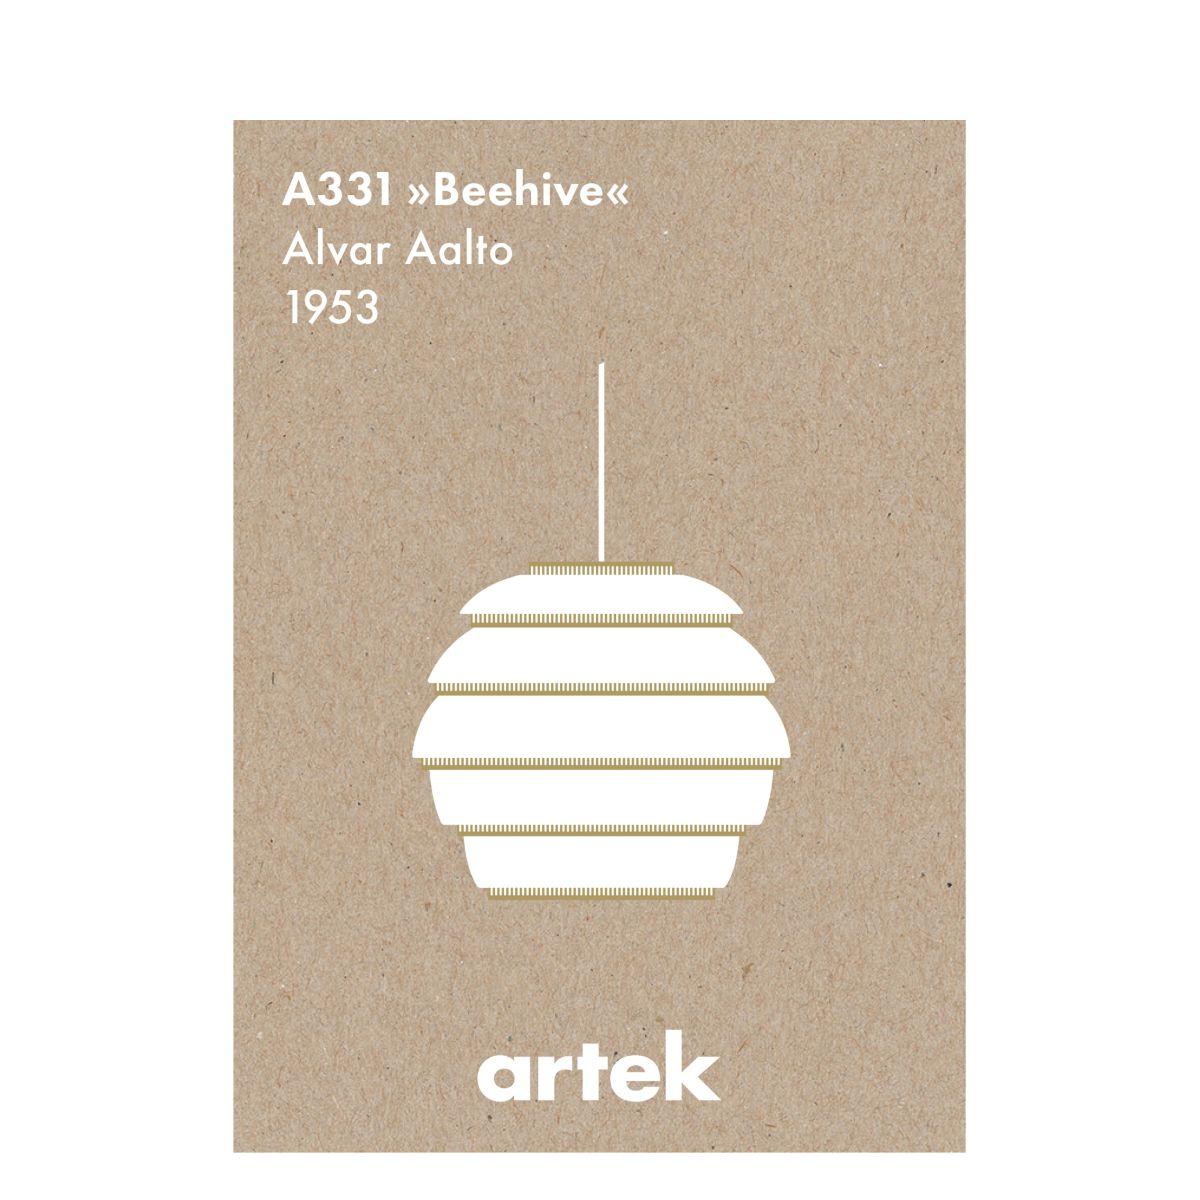 Artek-Icons-Greige-Pendant-Light-A331-Beehive-1843106_Web-1977560